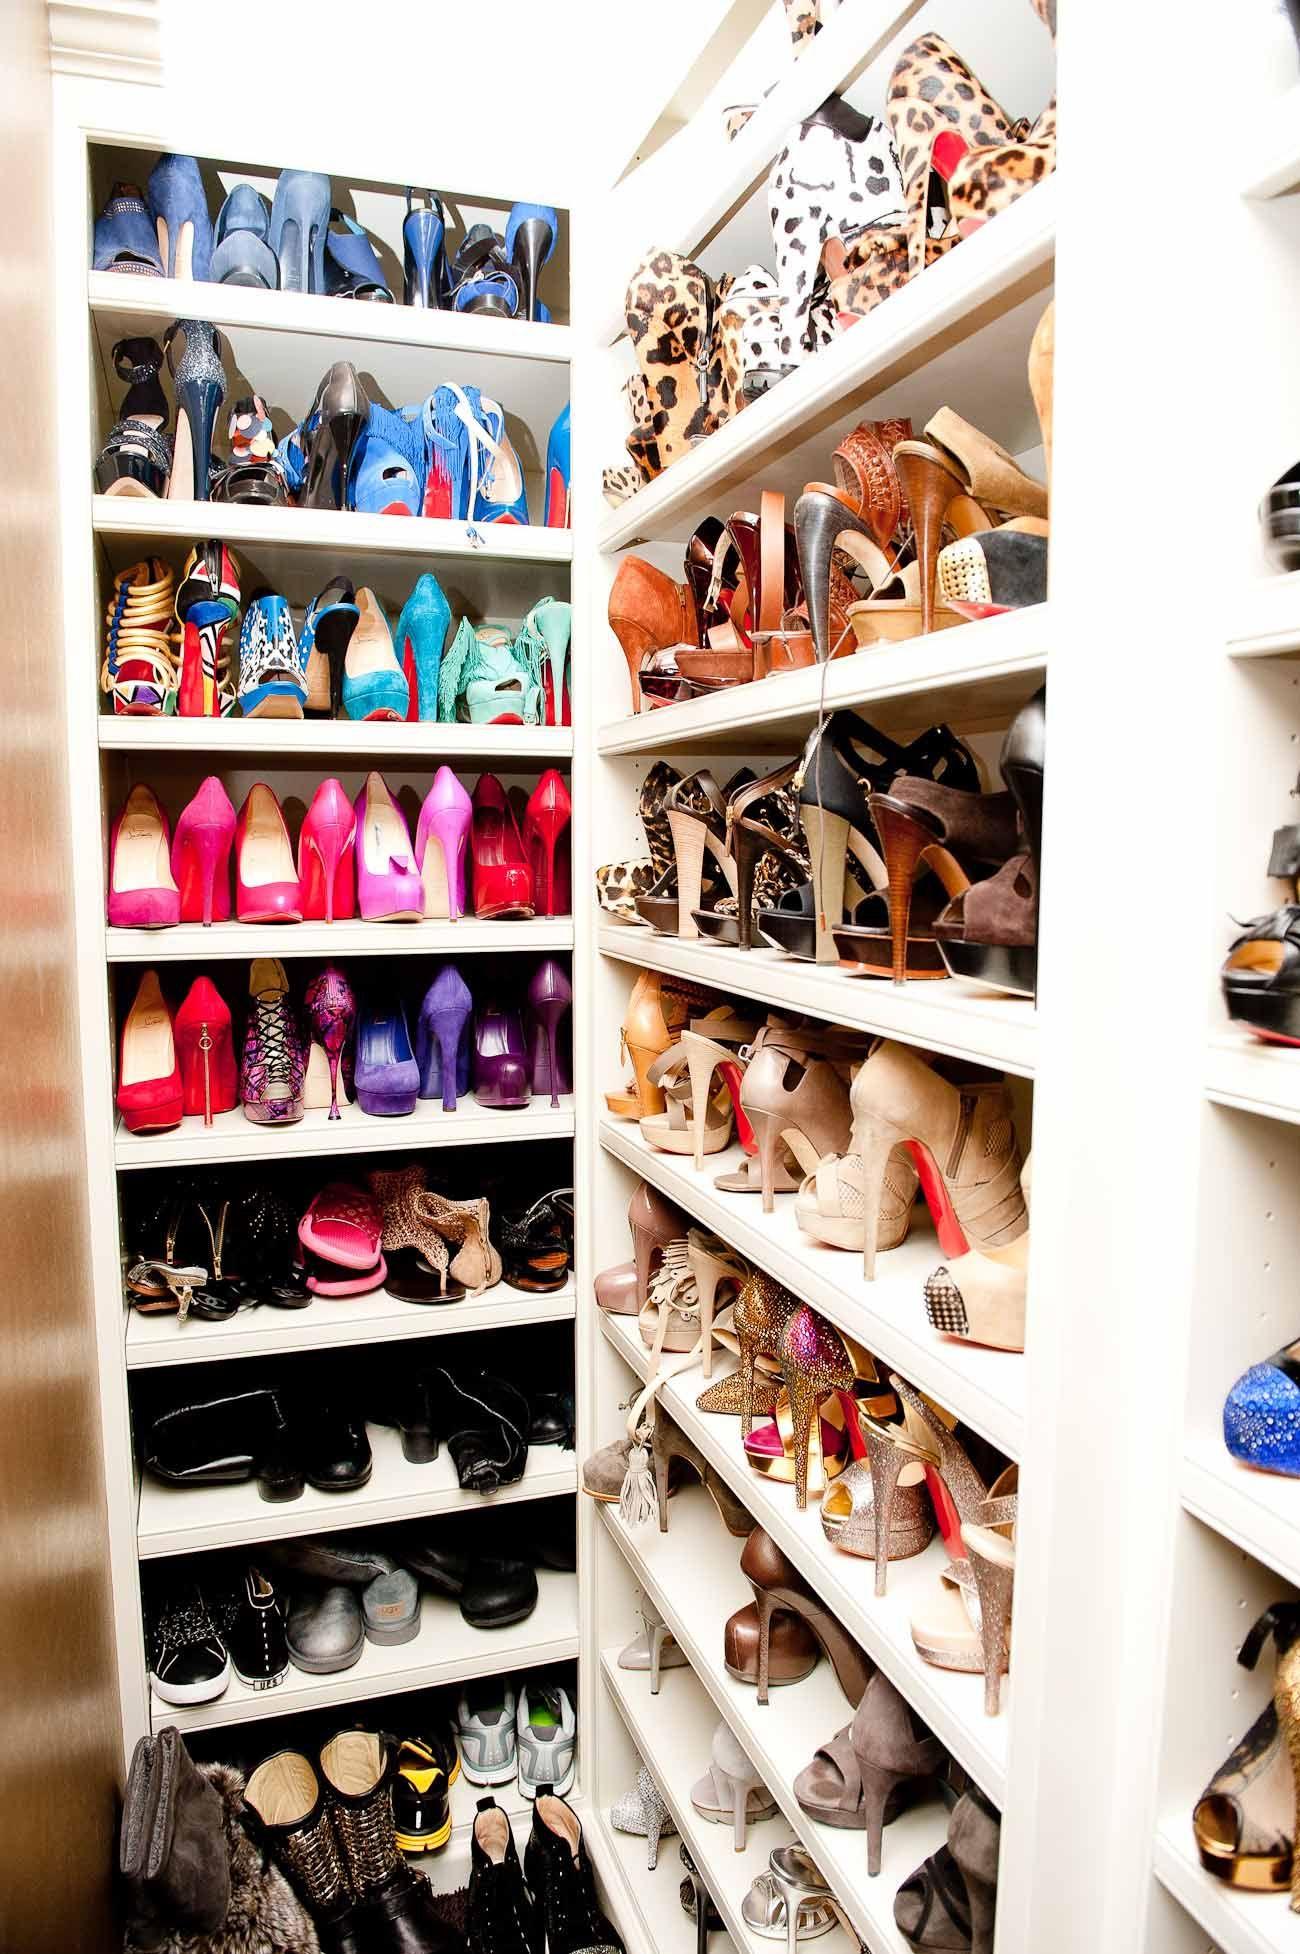 khlo kardashian s closet has at least three full walls of shoes rh pinterest com